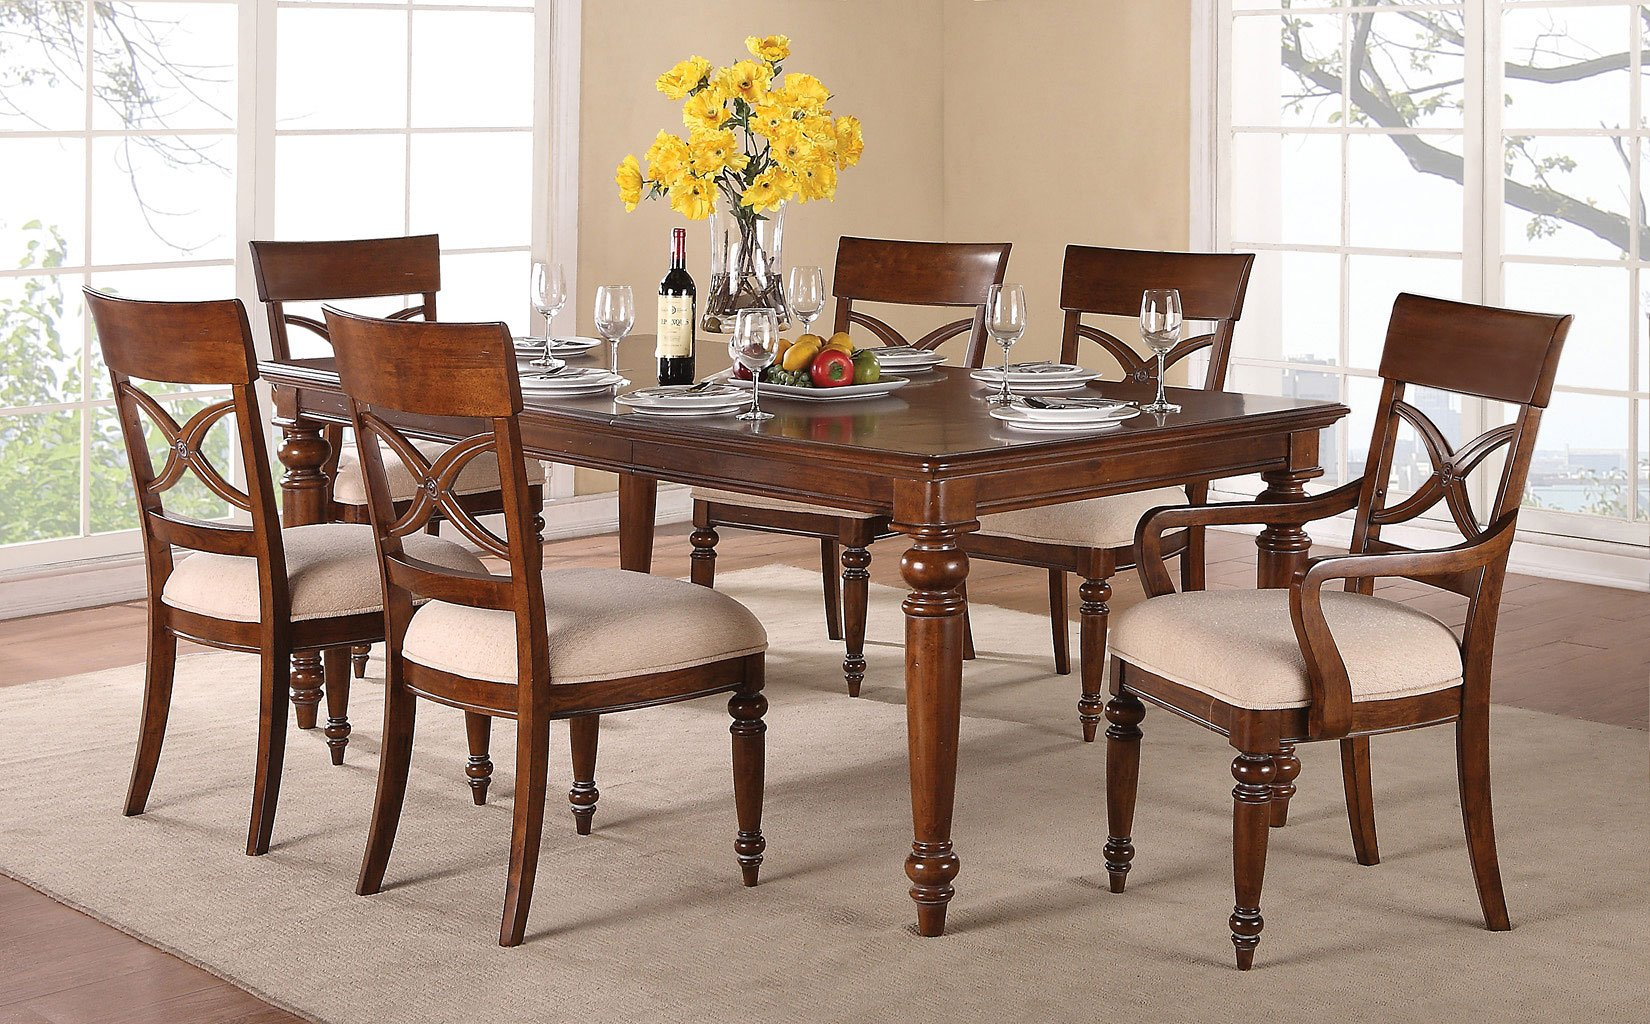 Ordinaire American Heritage Dining Room Set